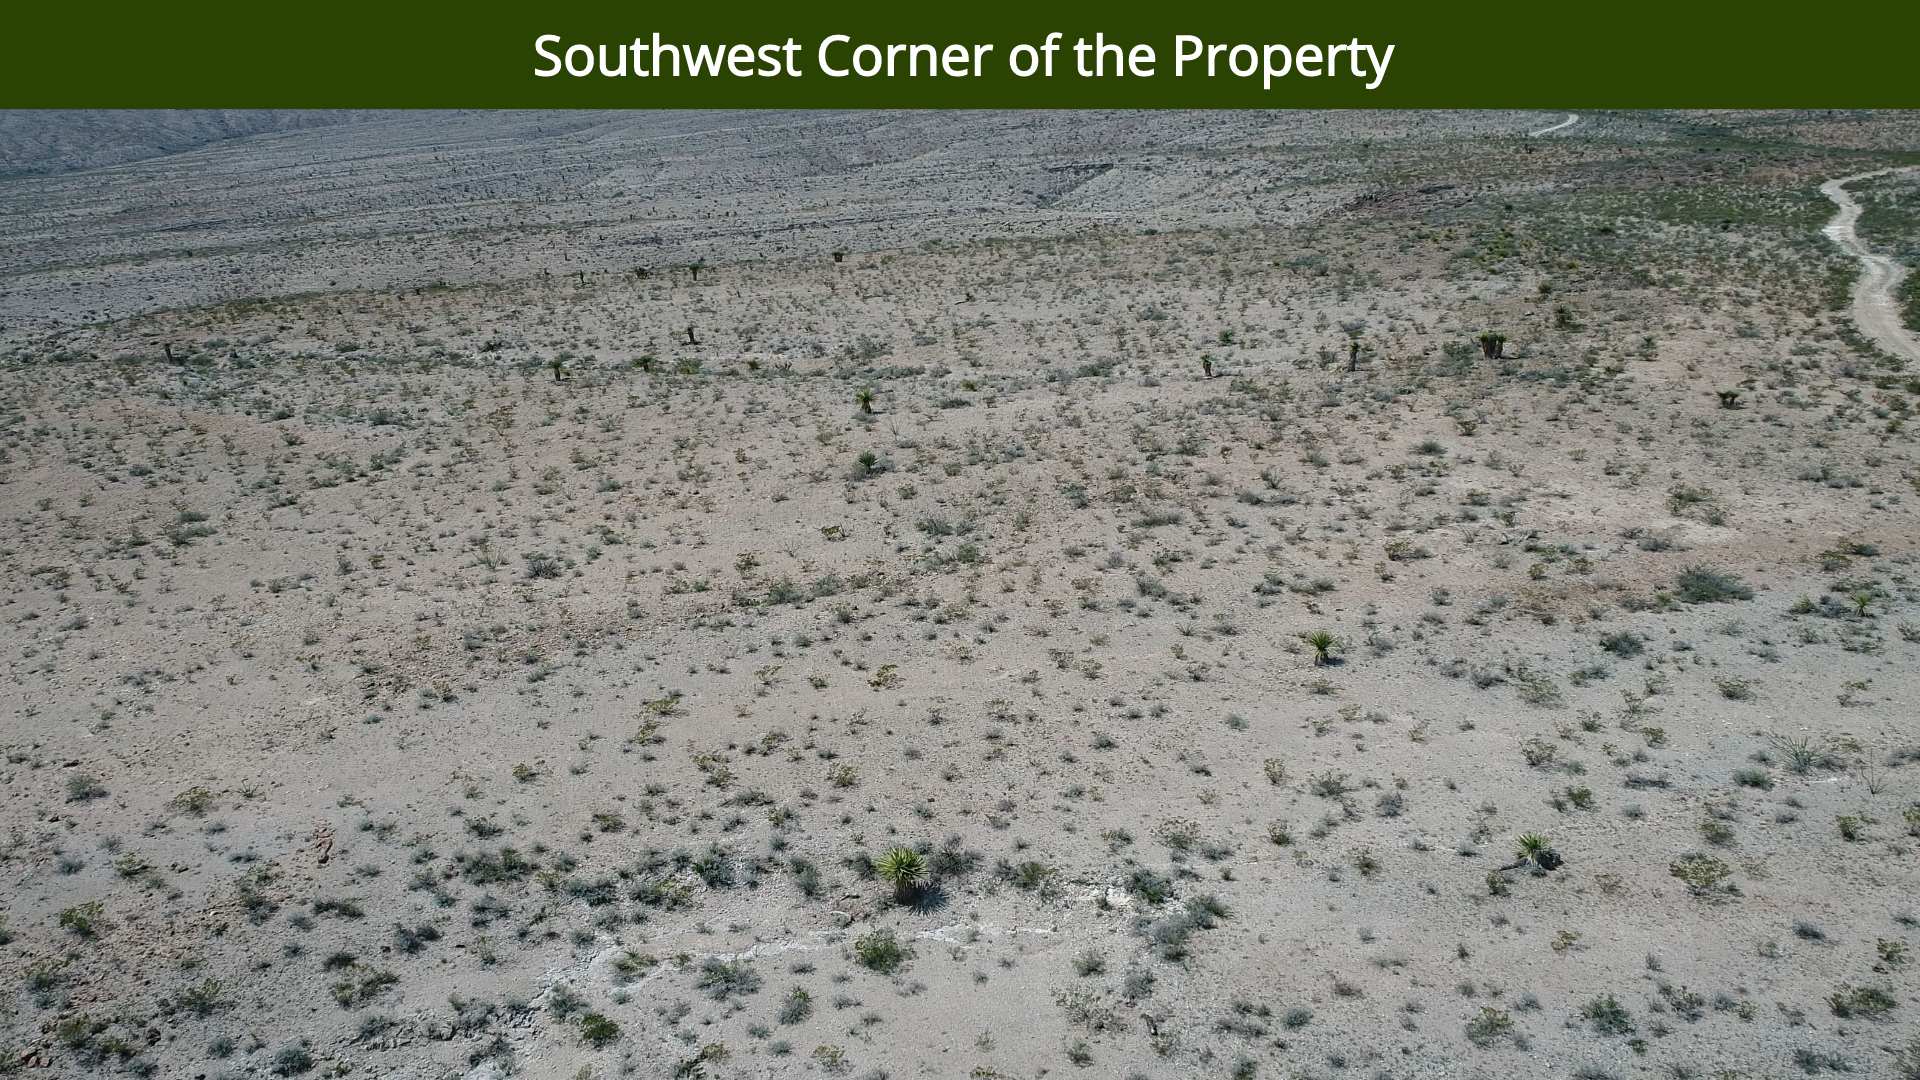 Southwest Corner of the Property